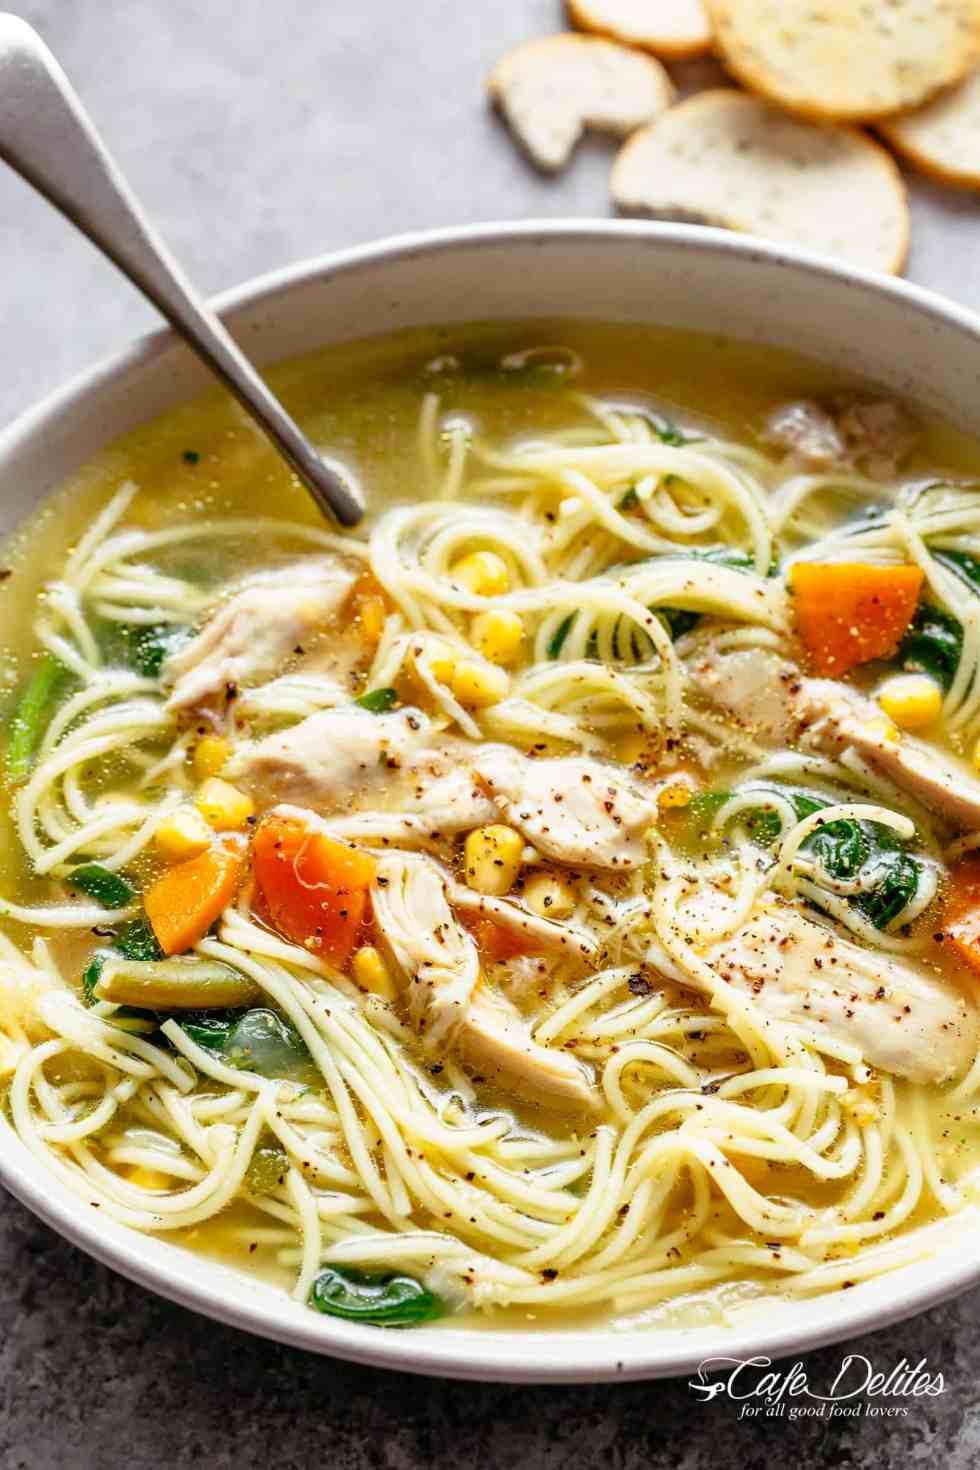 chicken noodle soup - cafe delites